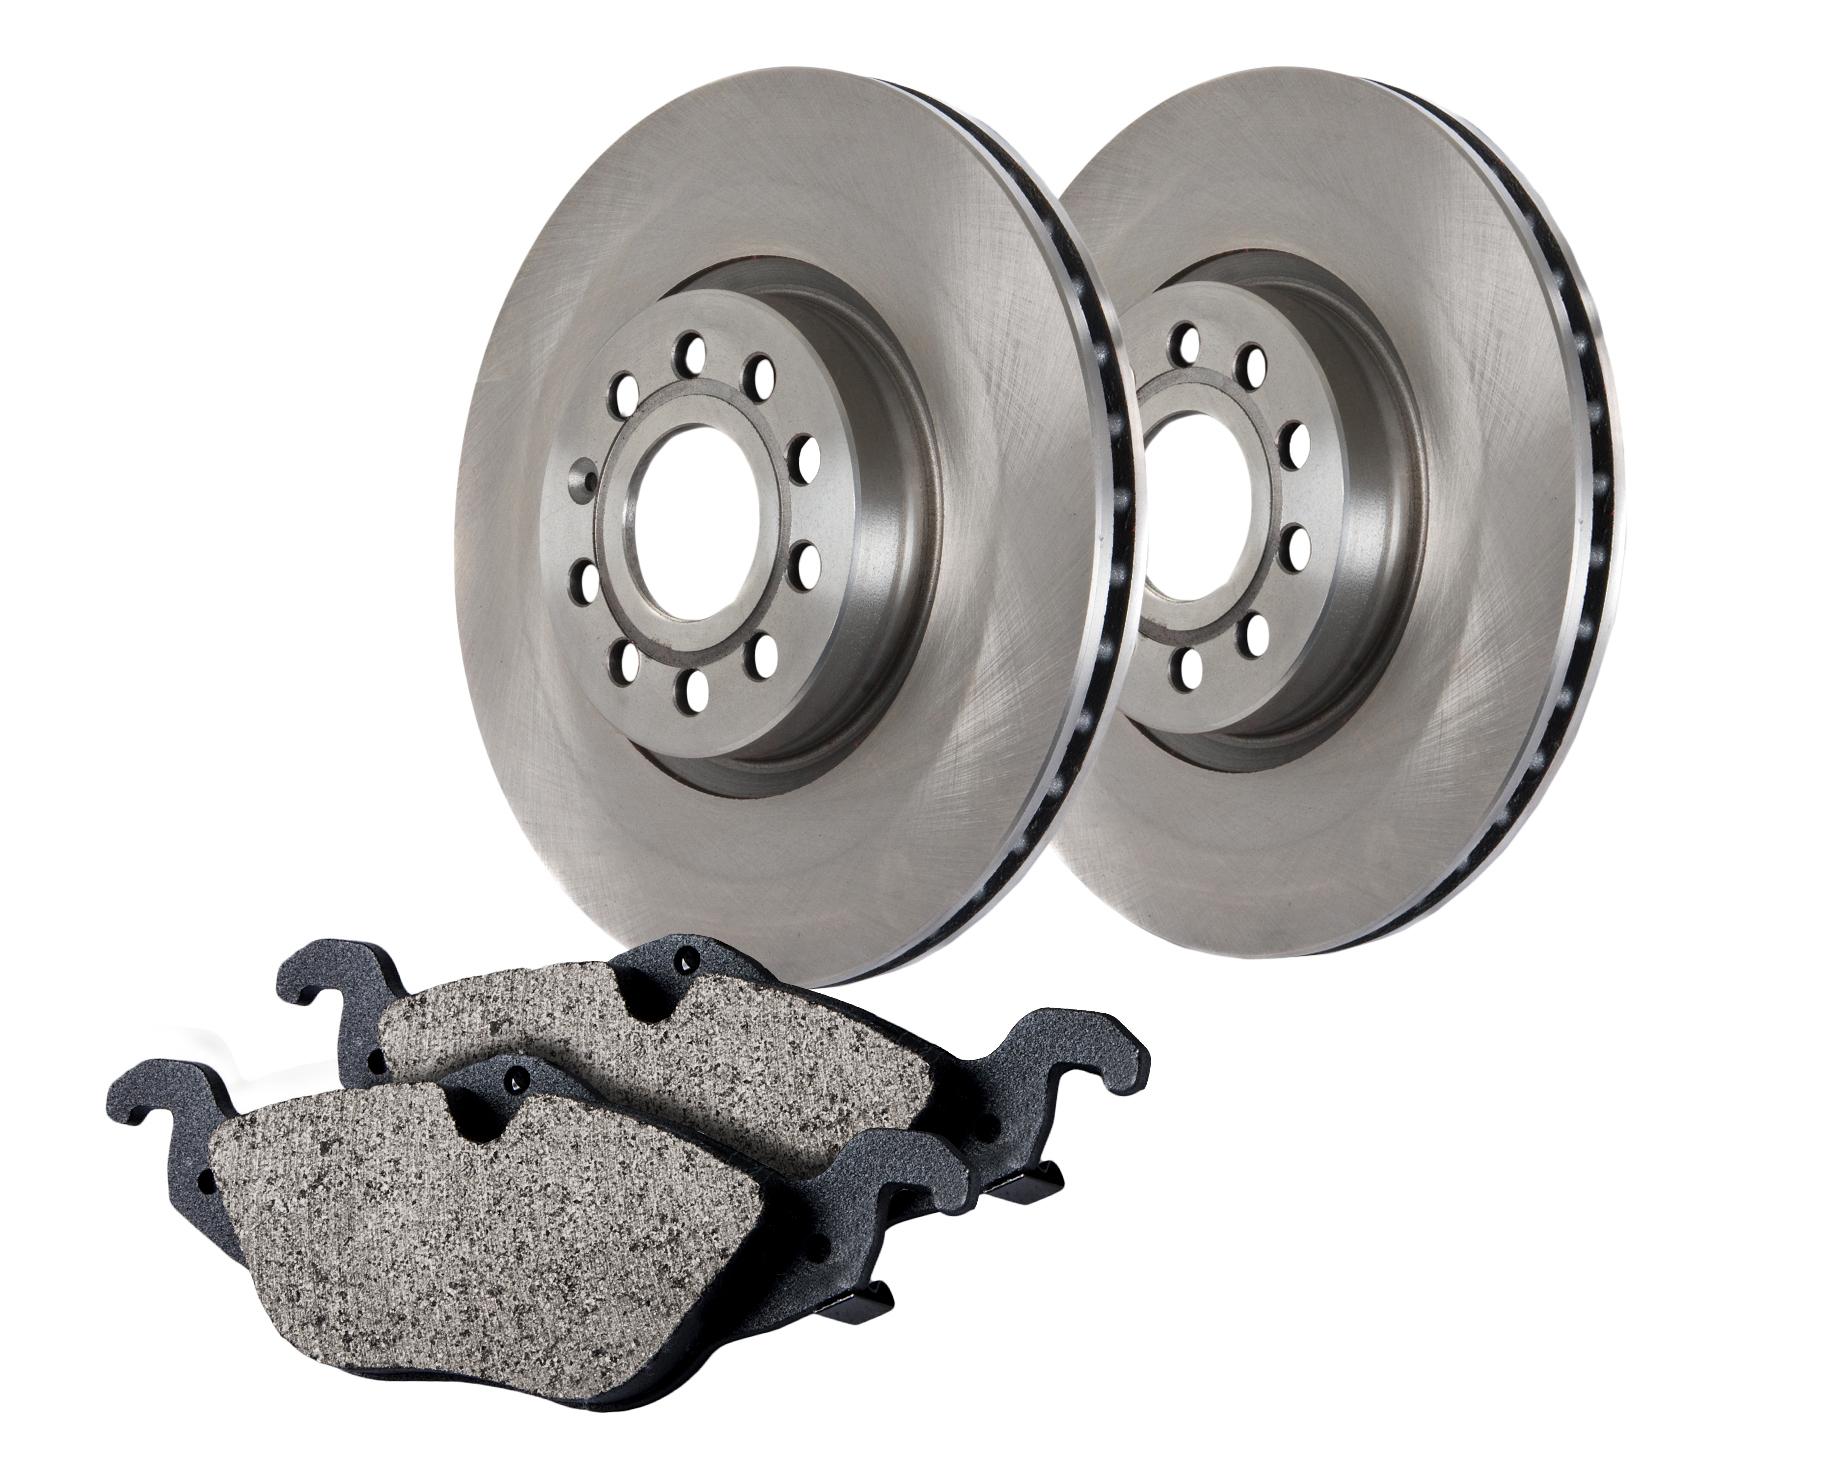 Centric Brake Parts 905.61004 Brake Rotor and Pad Kit, Premium, Semi-Metallic Pads, Iron, Natural, Ford Fullsize Car 2003-11, Kit